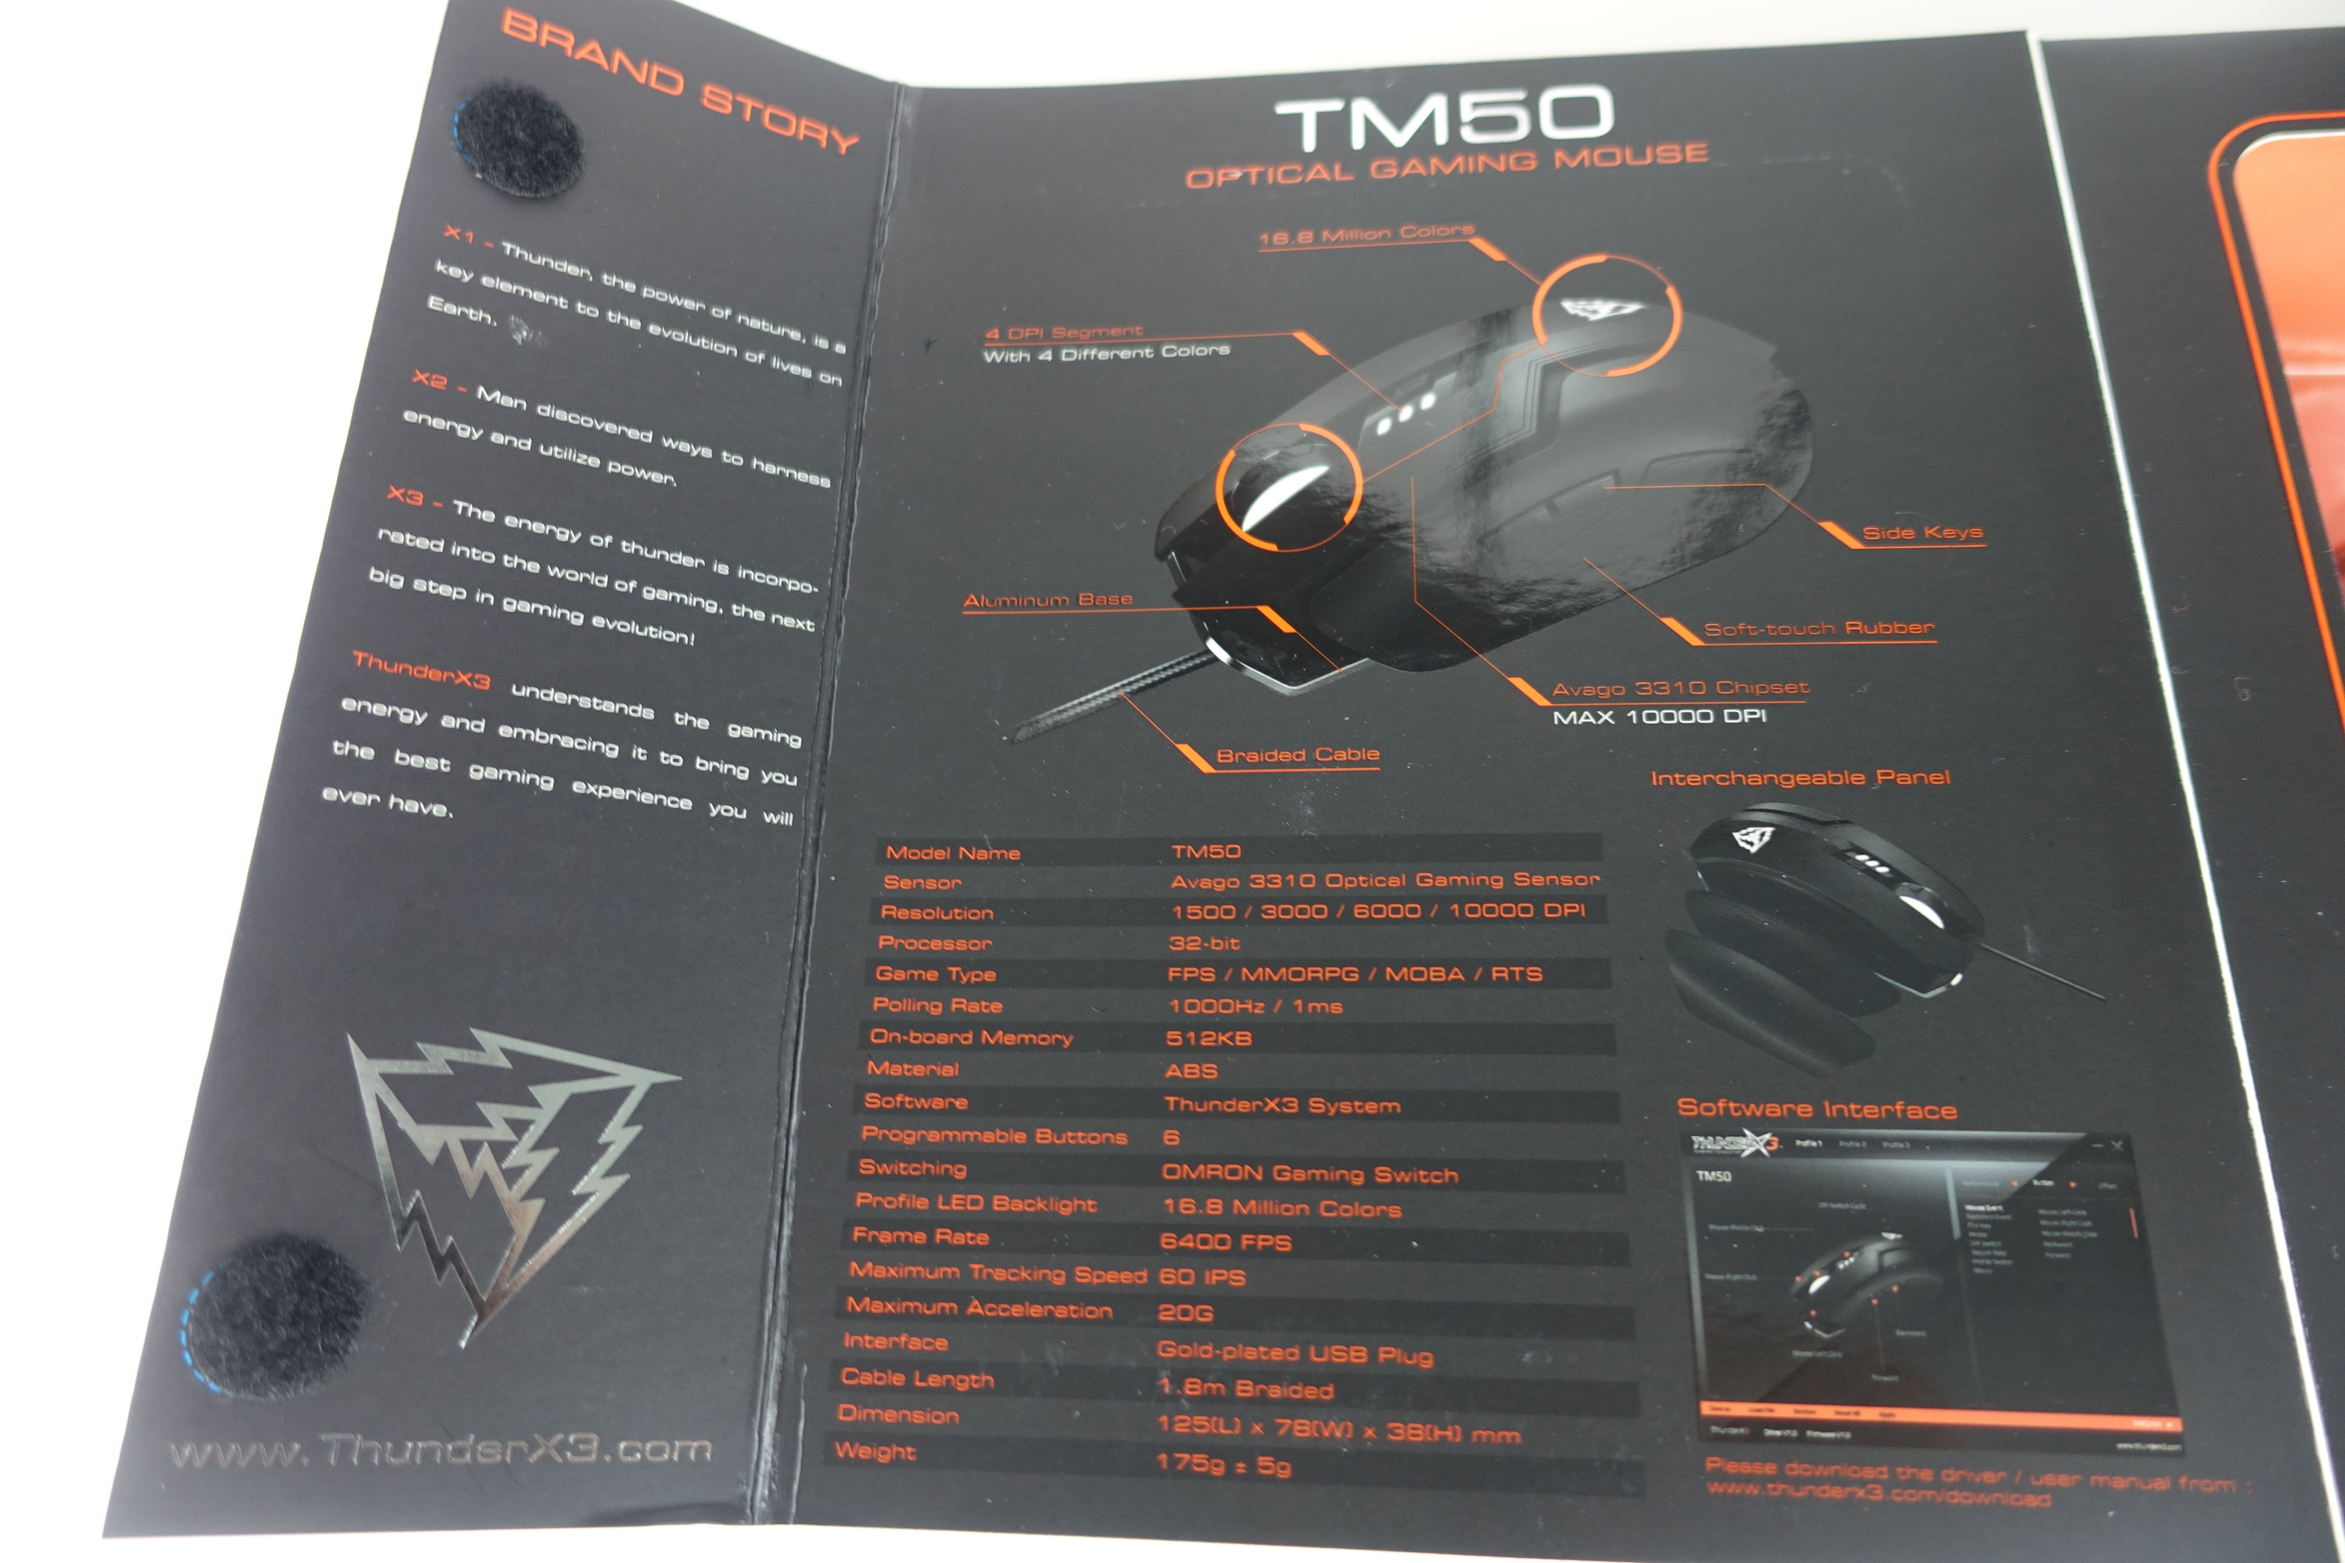 TM50-6